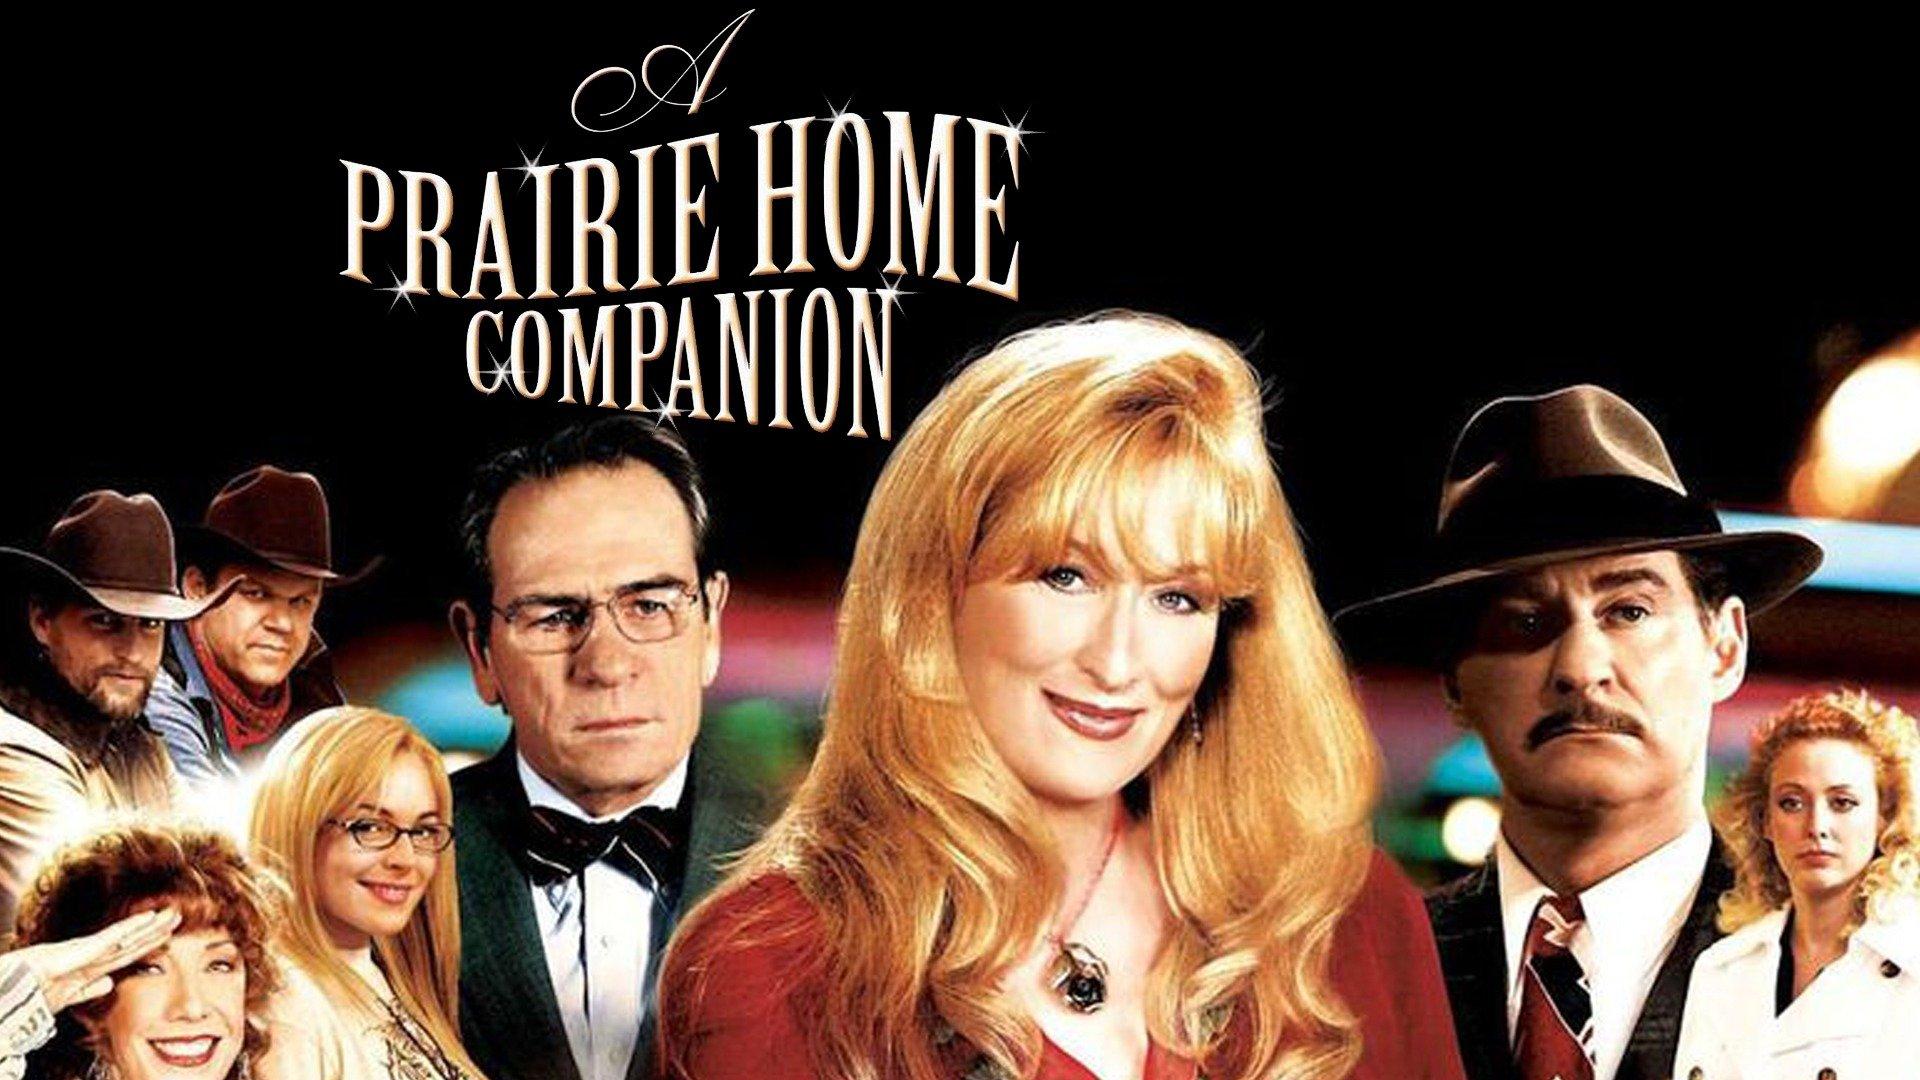 A Prairie Home Companion Audience Reviews Movietickets